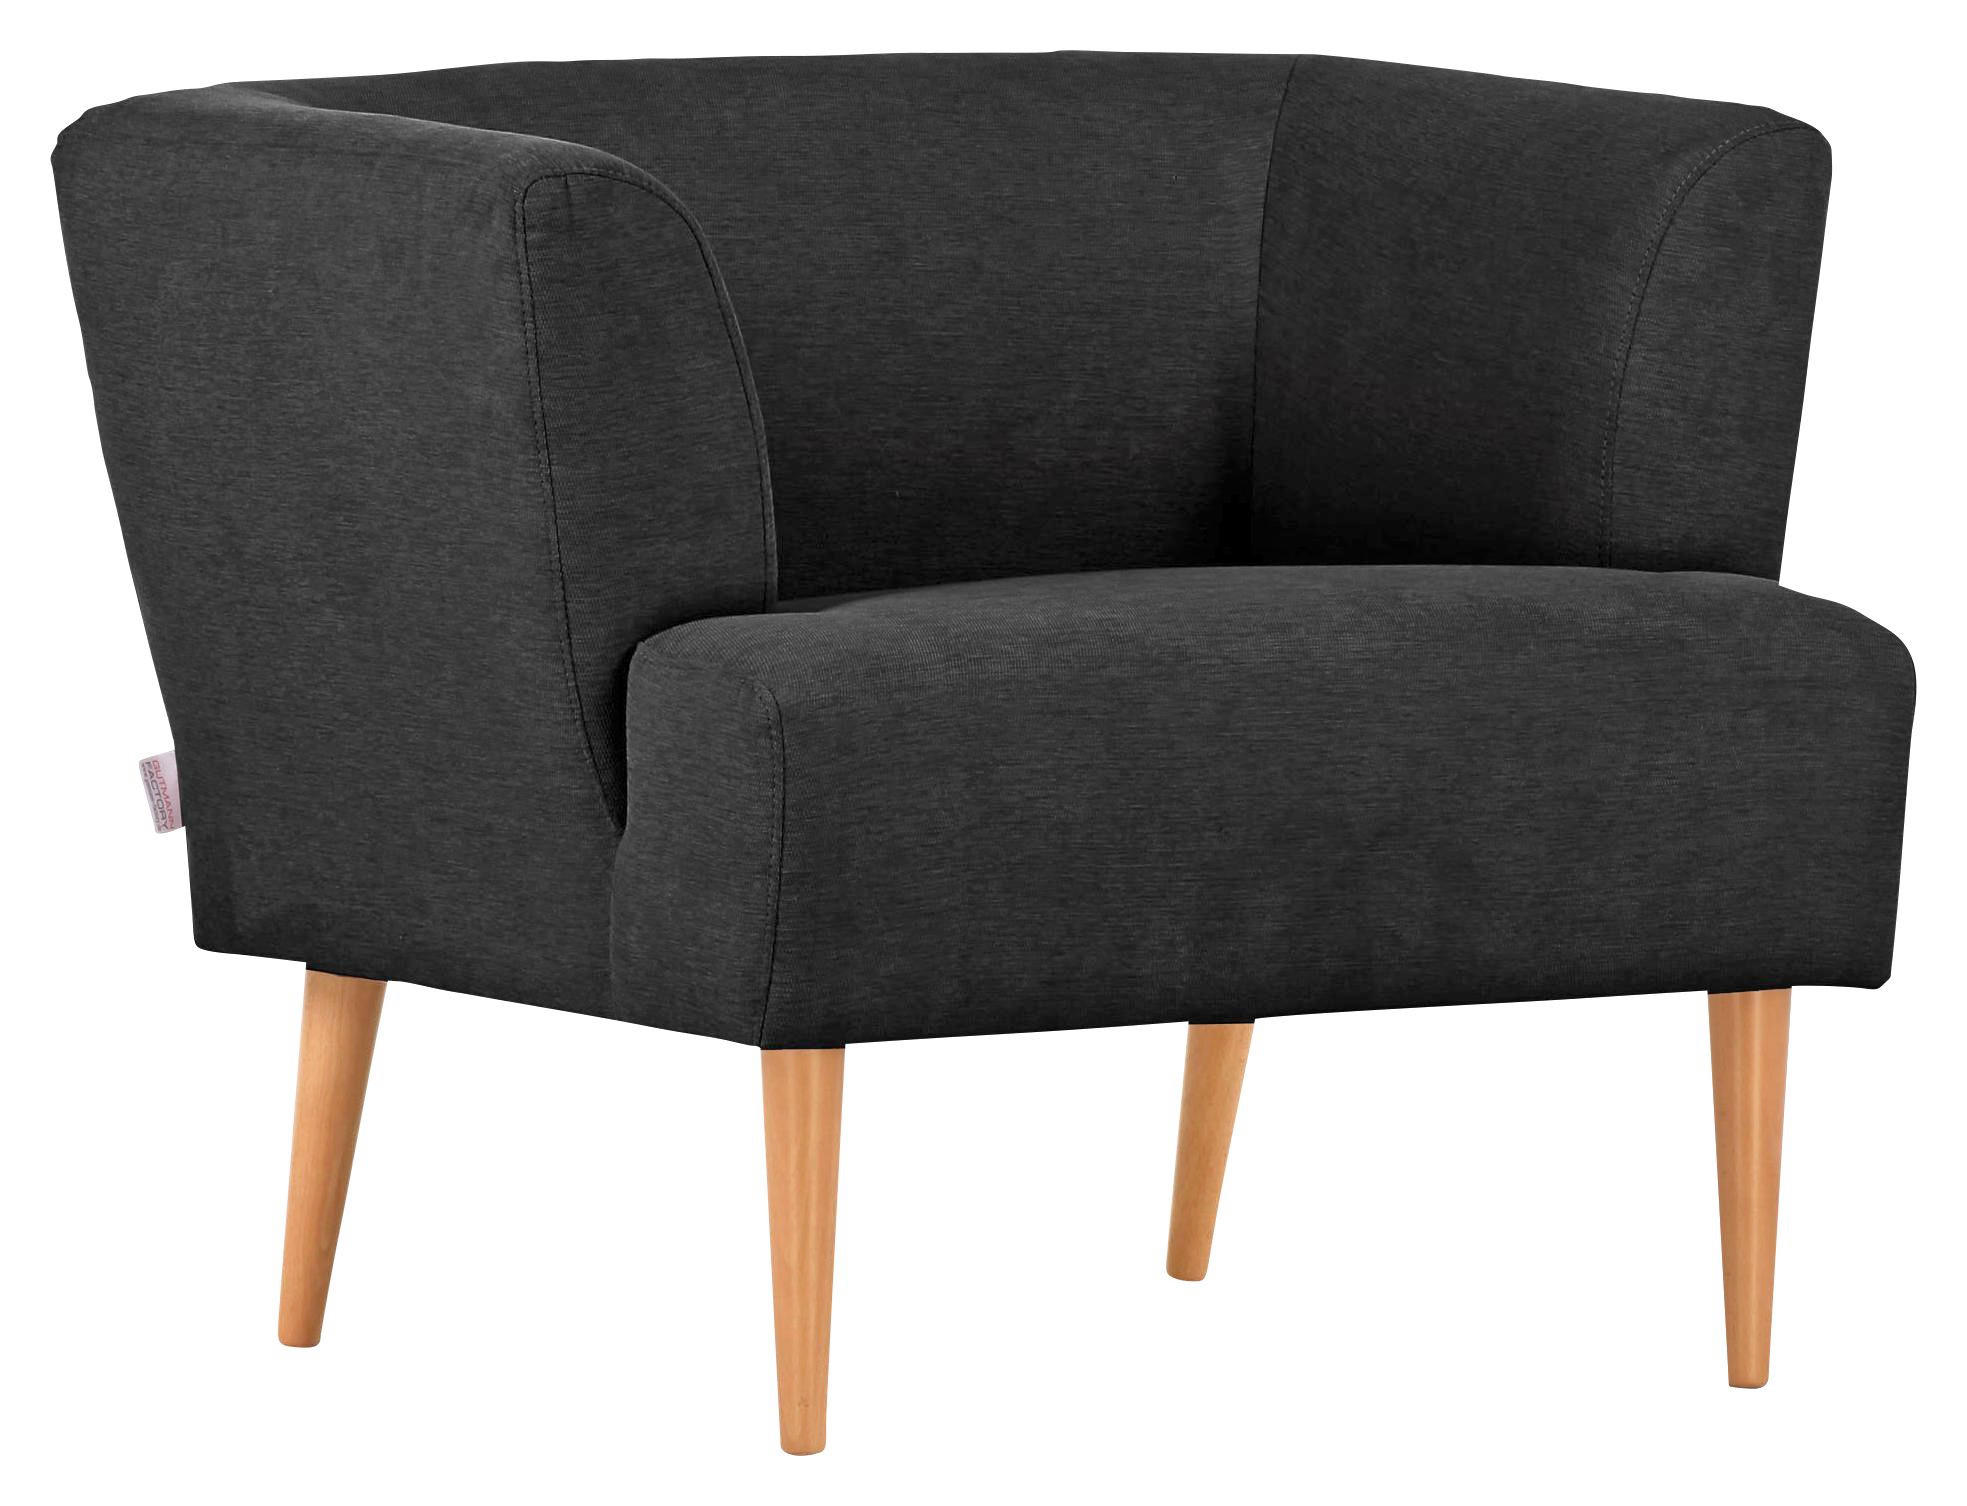 SESSEL Flachgewebe Dunkelgrau - Dunkelgrau/Naturfarben, Design, Holz/Textil (85/71/80cm) - HOM`IN